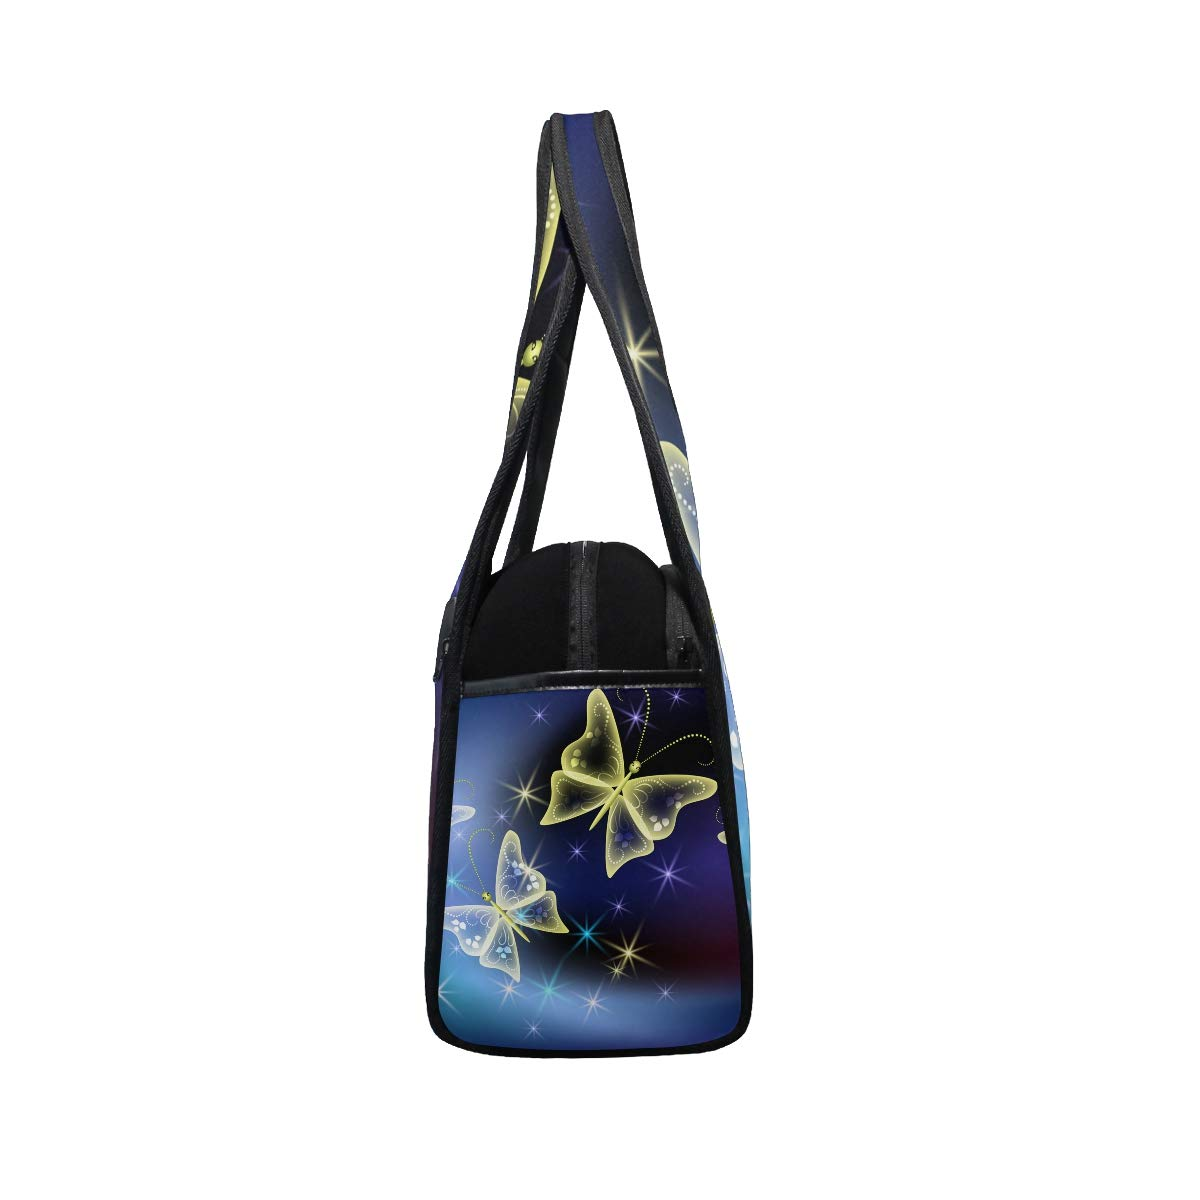 Gym Bag Sports Holdall Butterfly Canvas Shoulder Bag Overnight Travel Bag for Men and Women